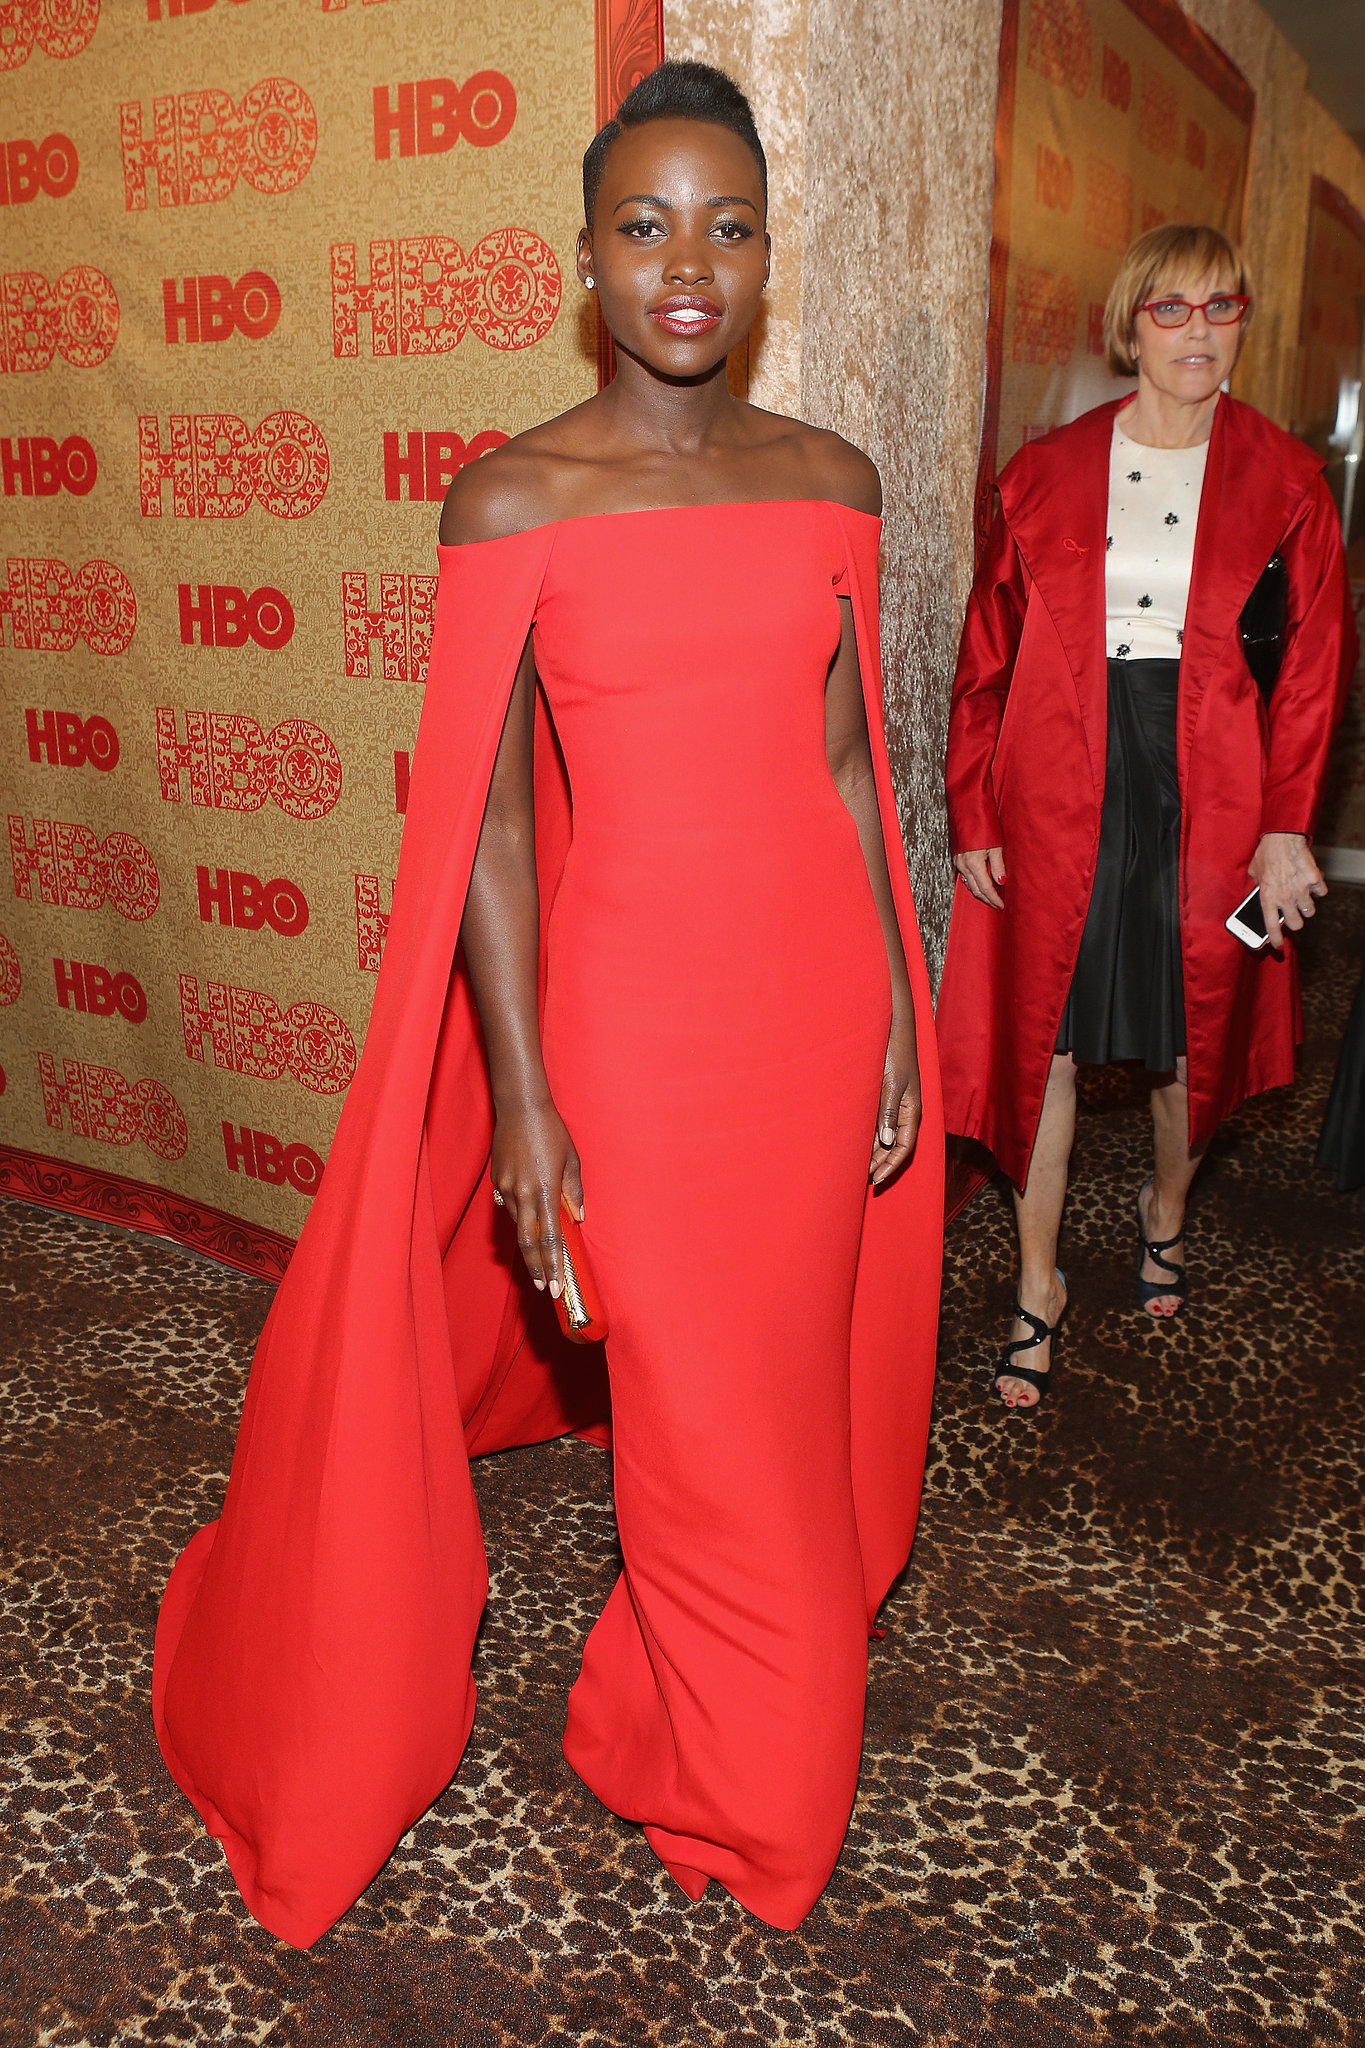 Lupita Nyong'o looked flawless at the HBO party.